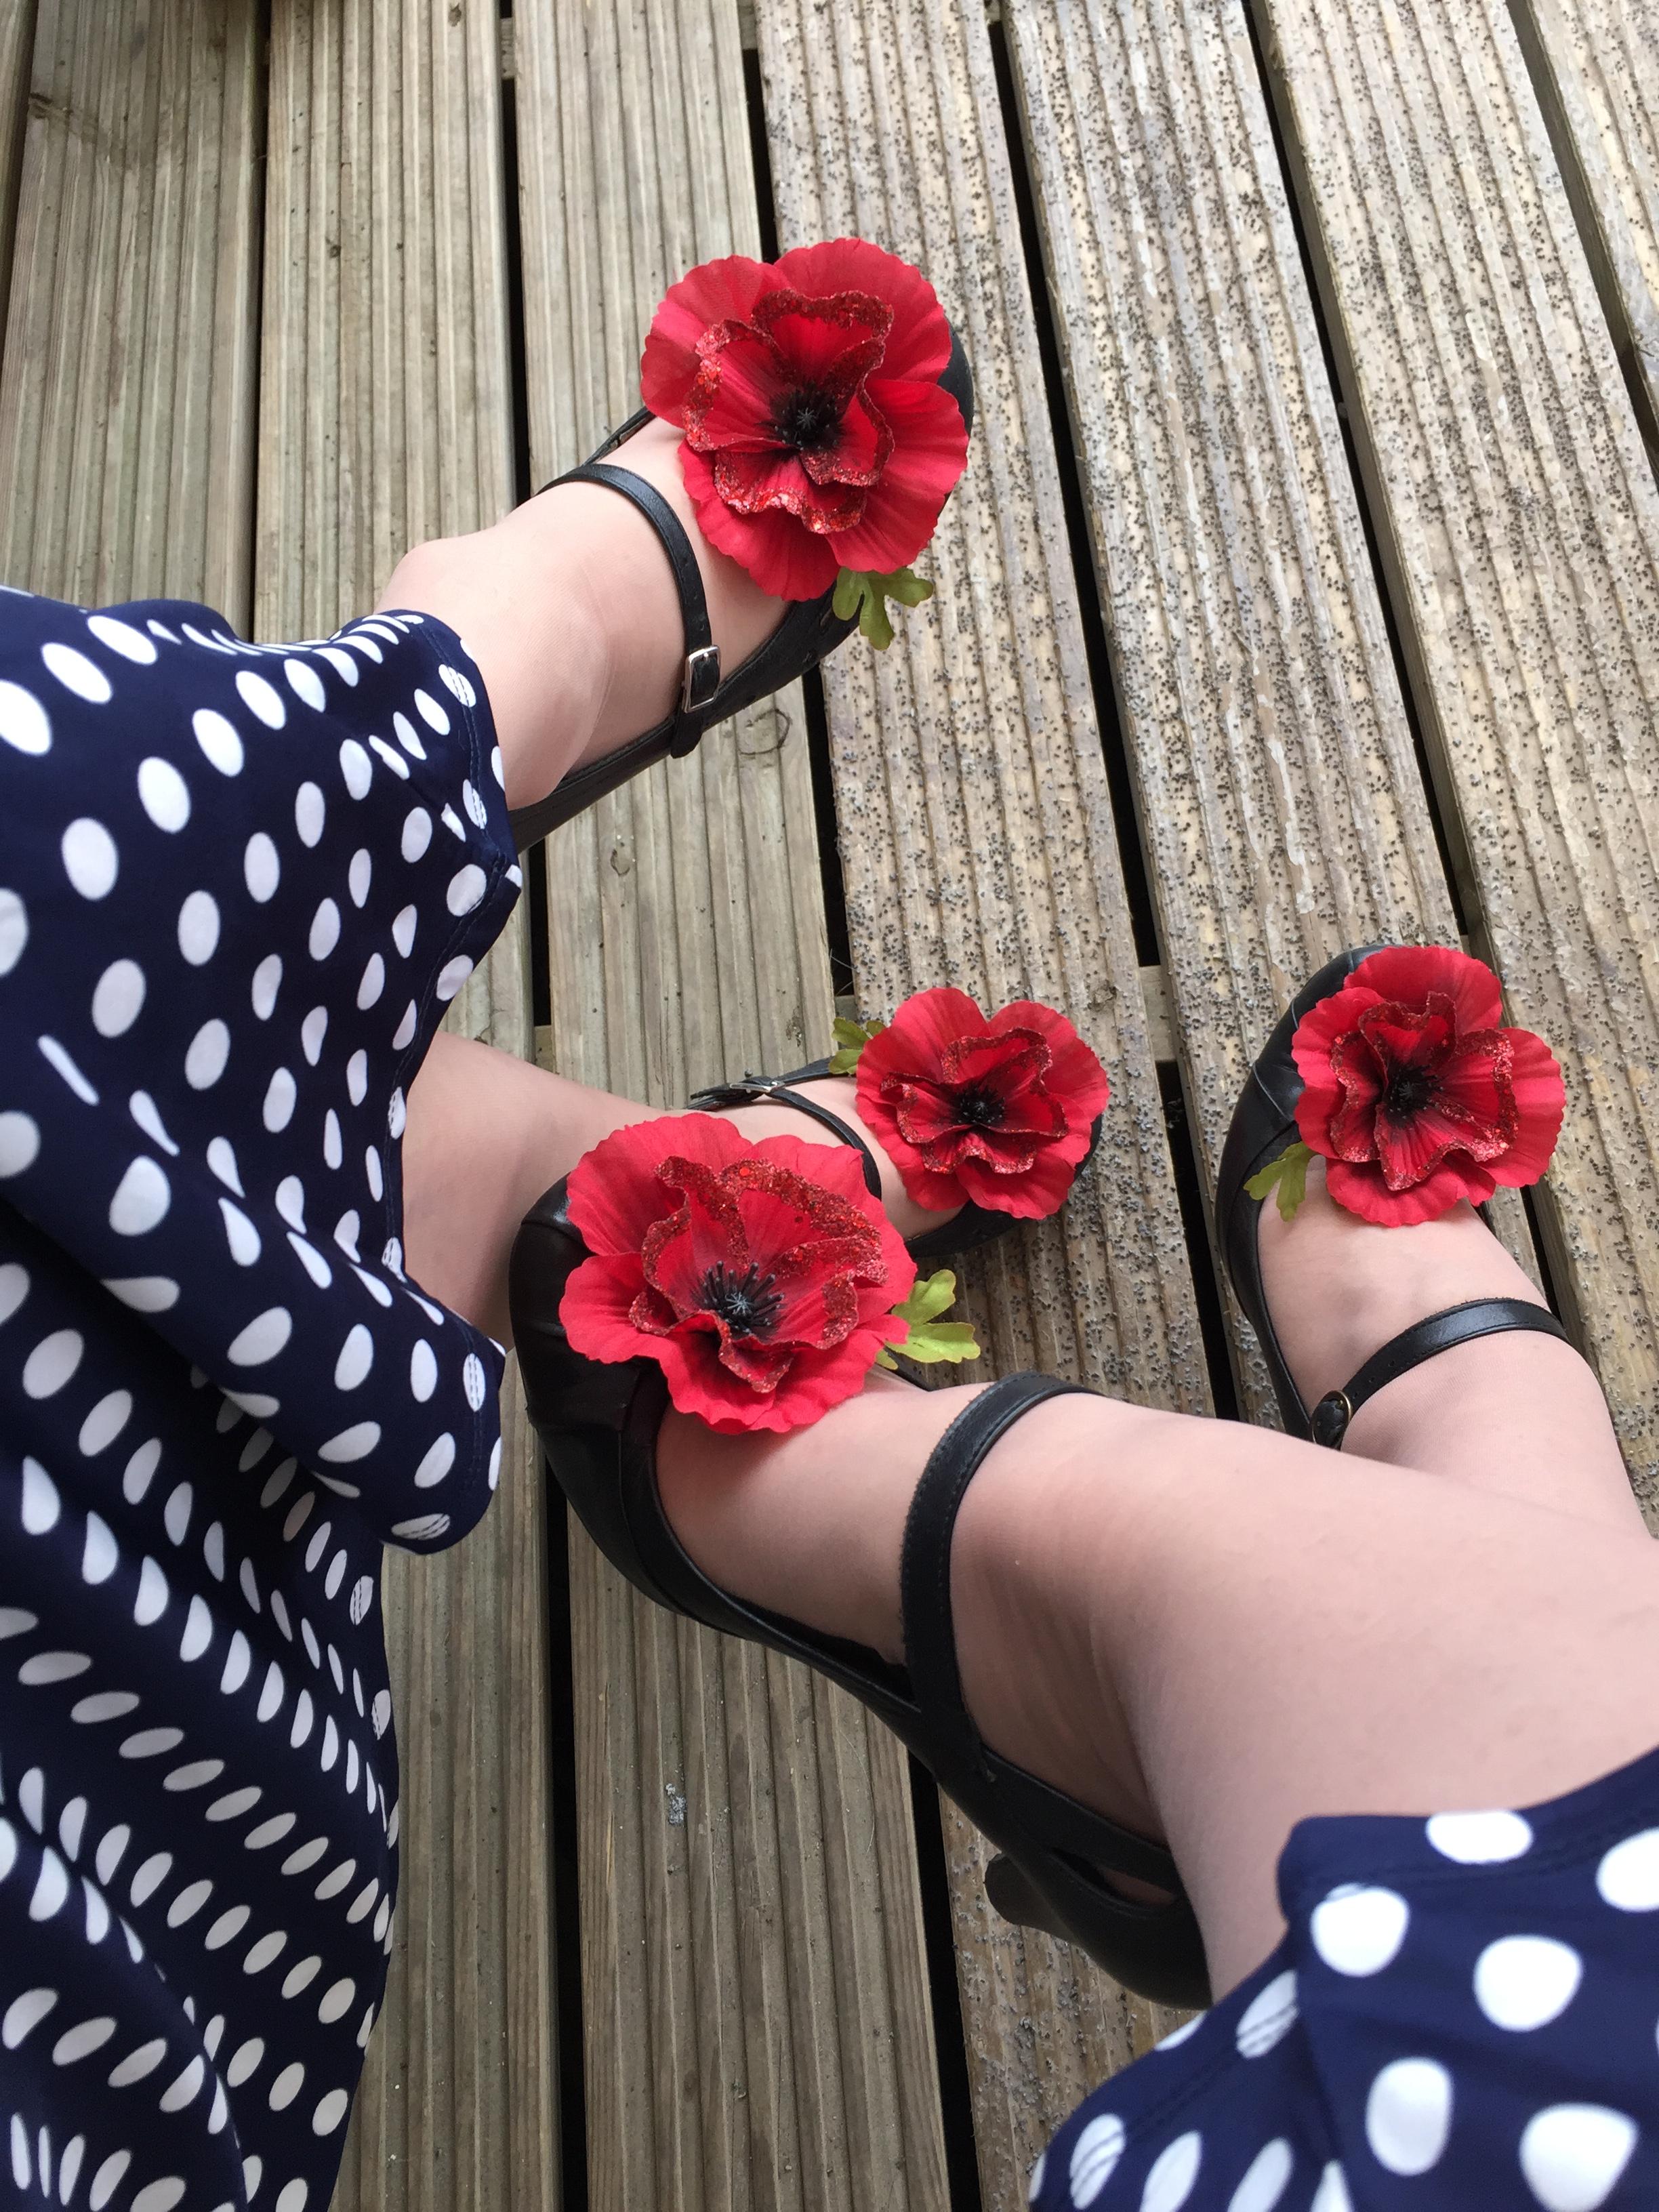 Every shoe needs a poppy